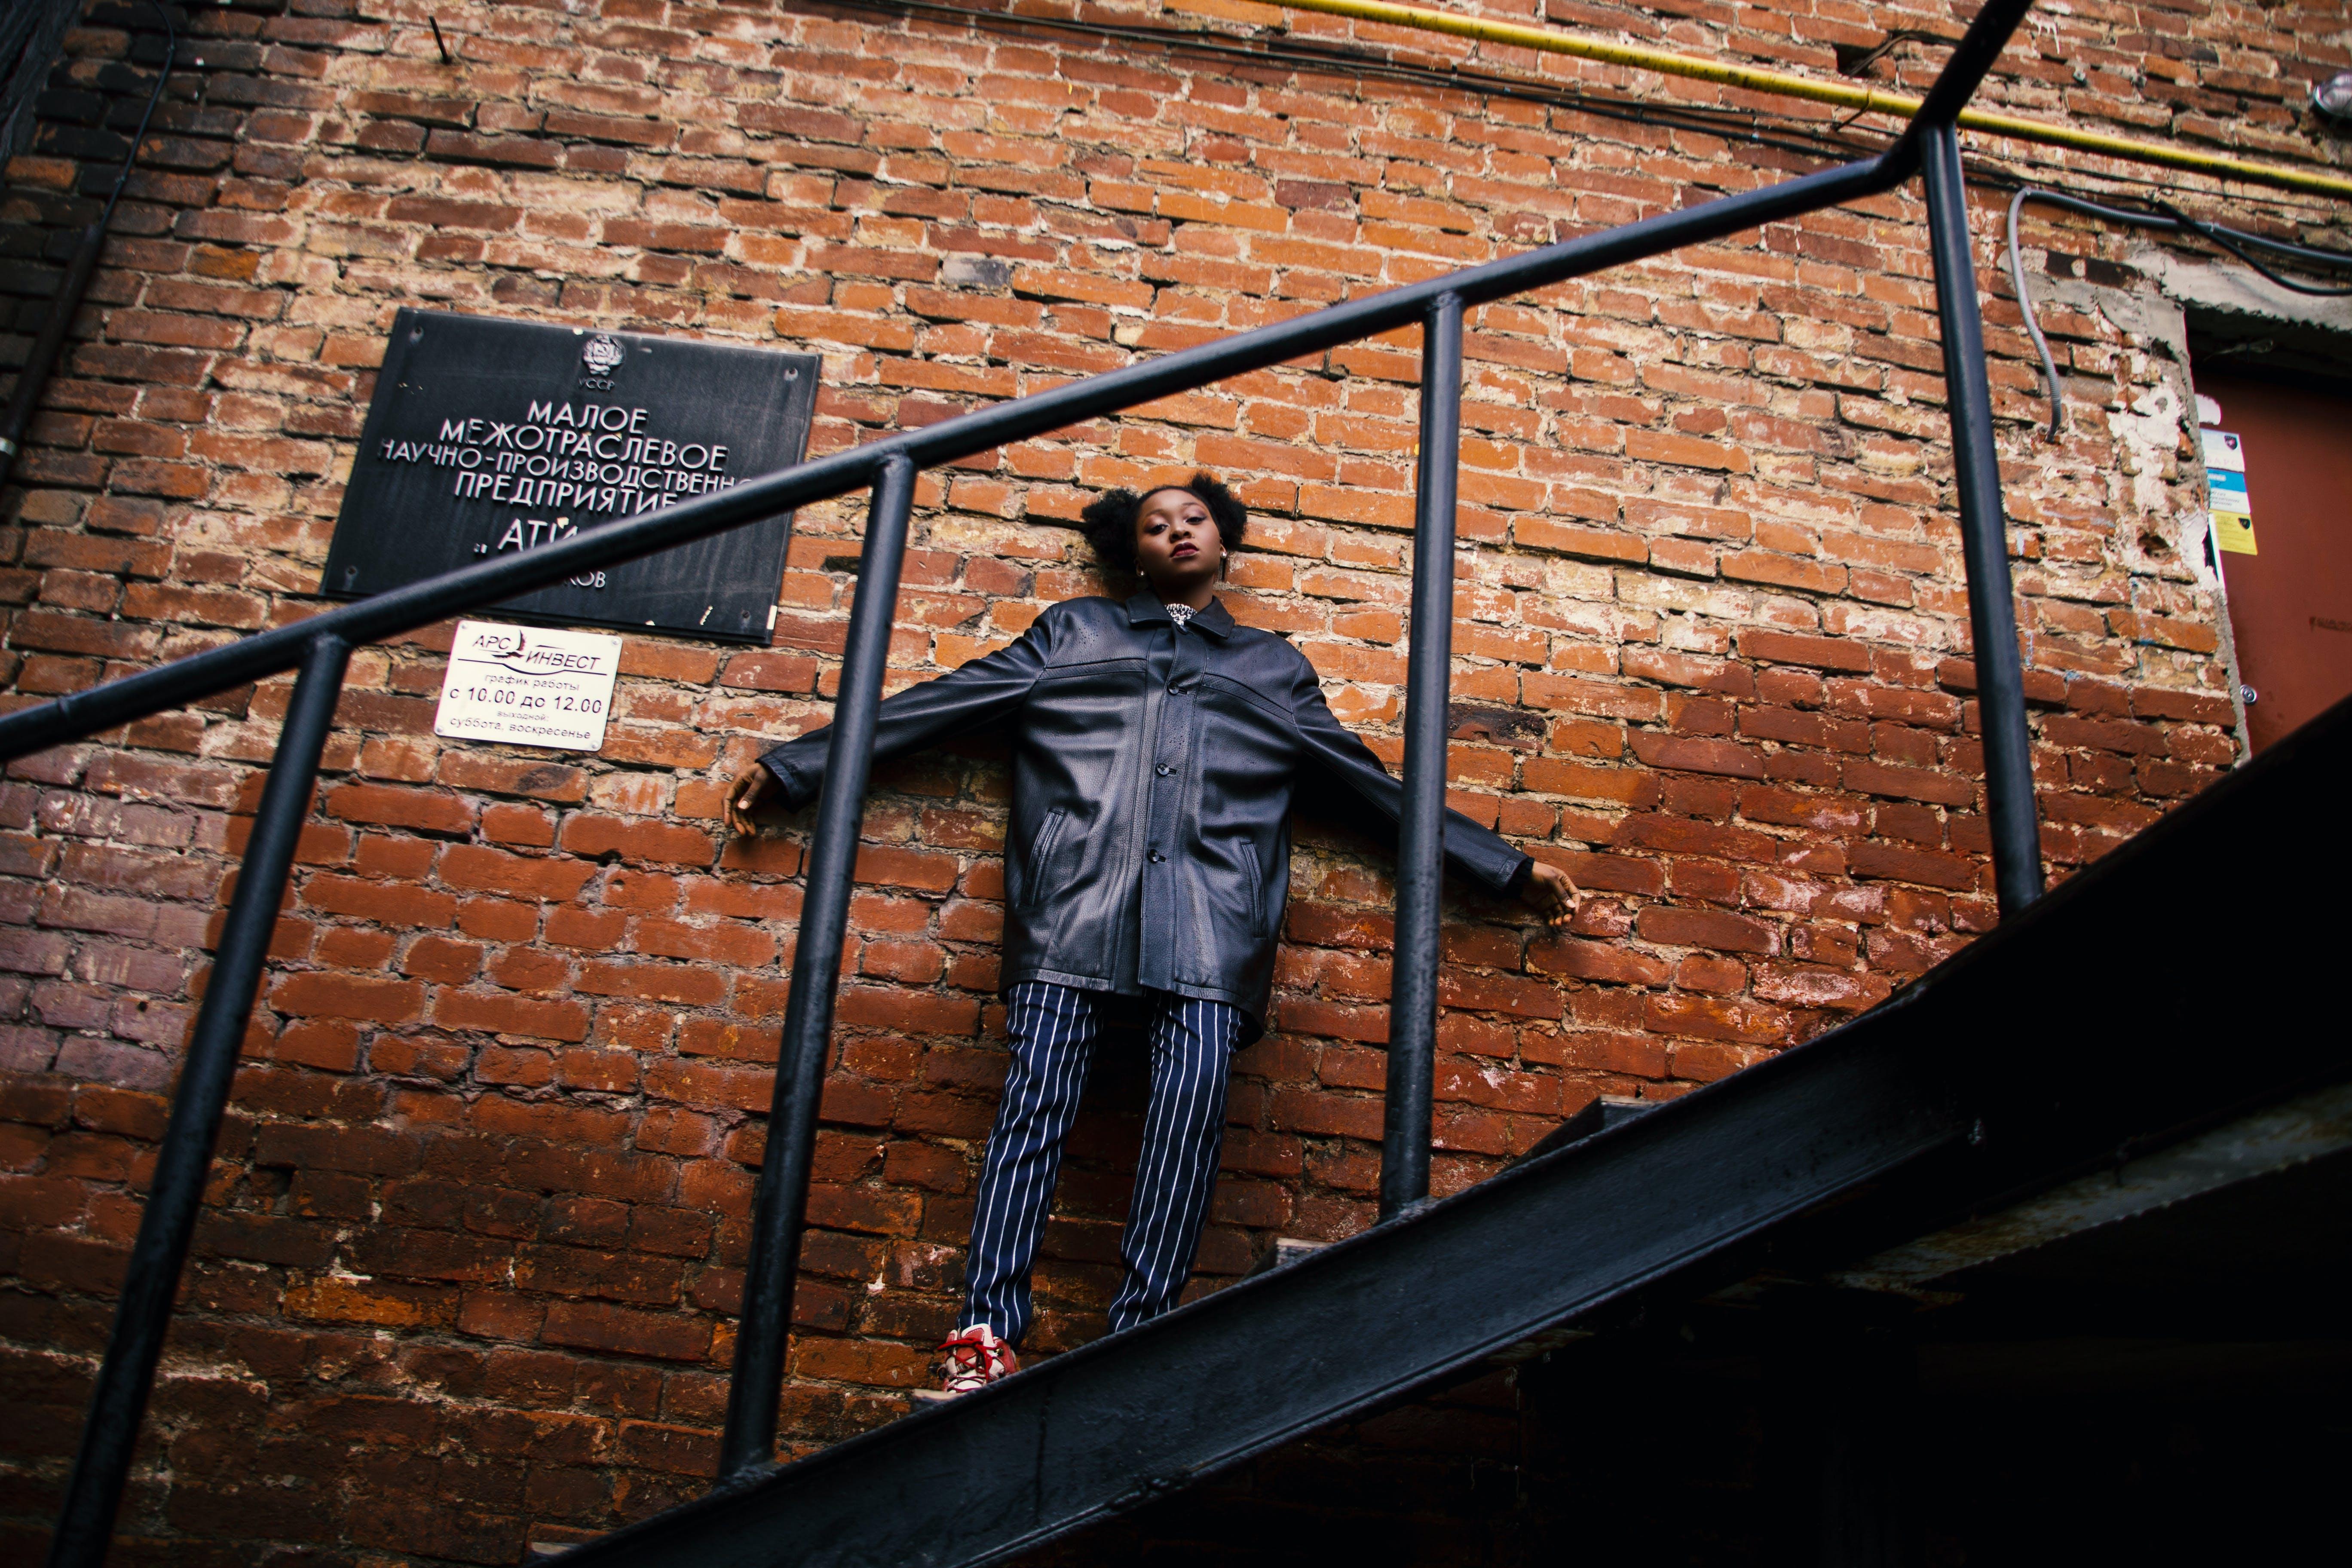 Fotos de stock gratuitas de arquitectura, atuendo, chaqueta de cuero negro, chica